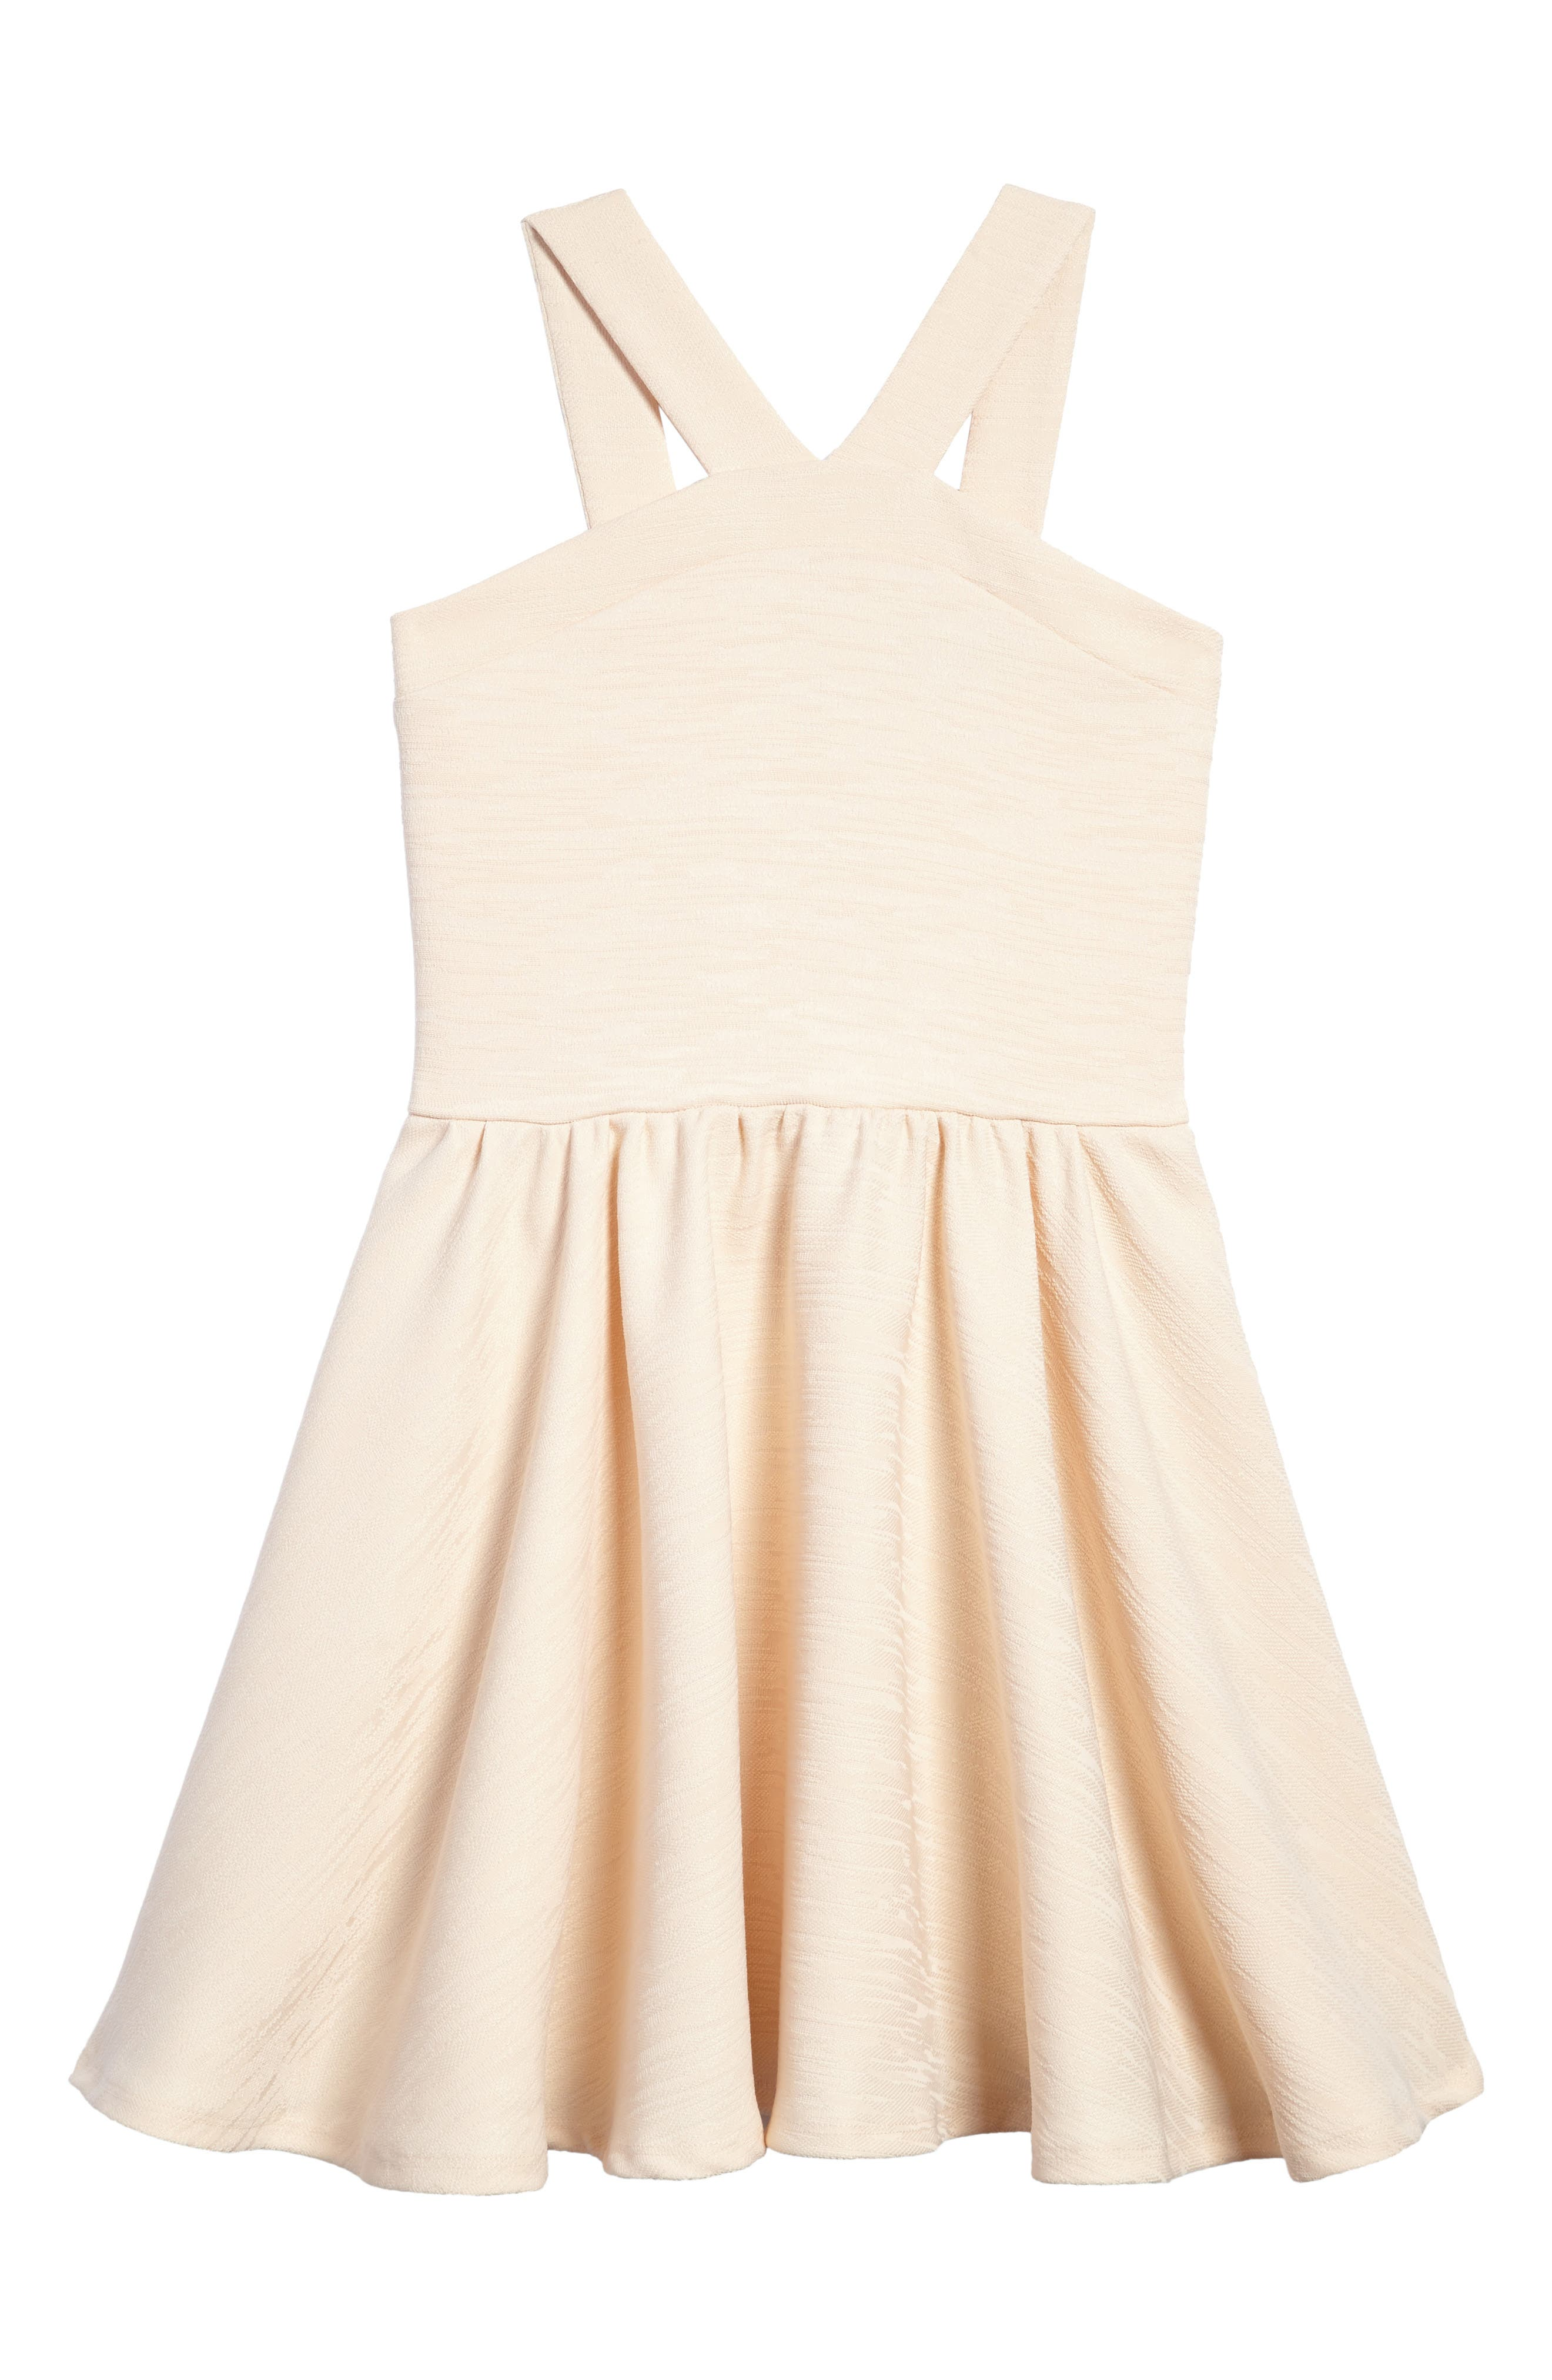 Stephanie Halter Dress,                             Main thumbnail 1, color,                             Beige